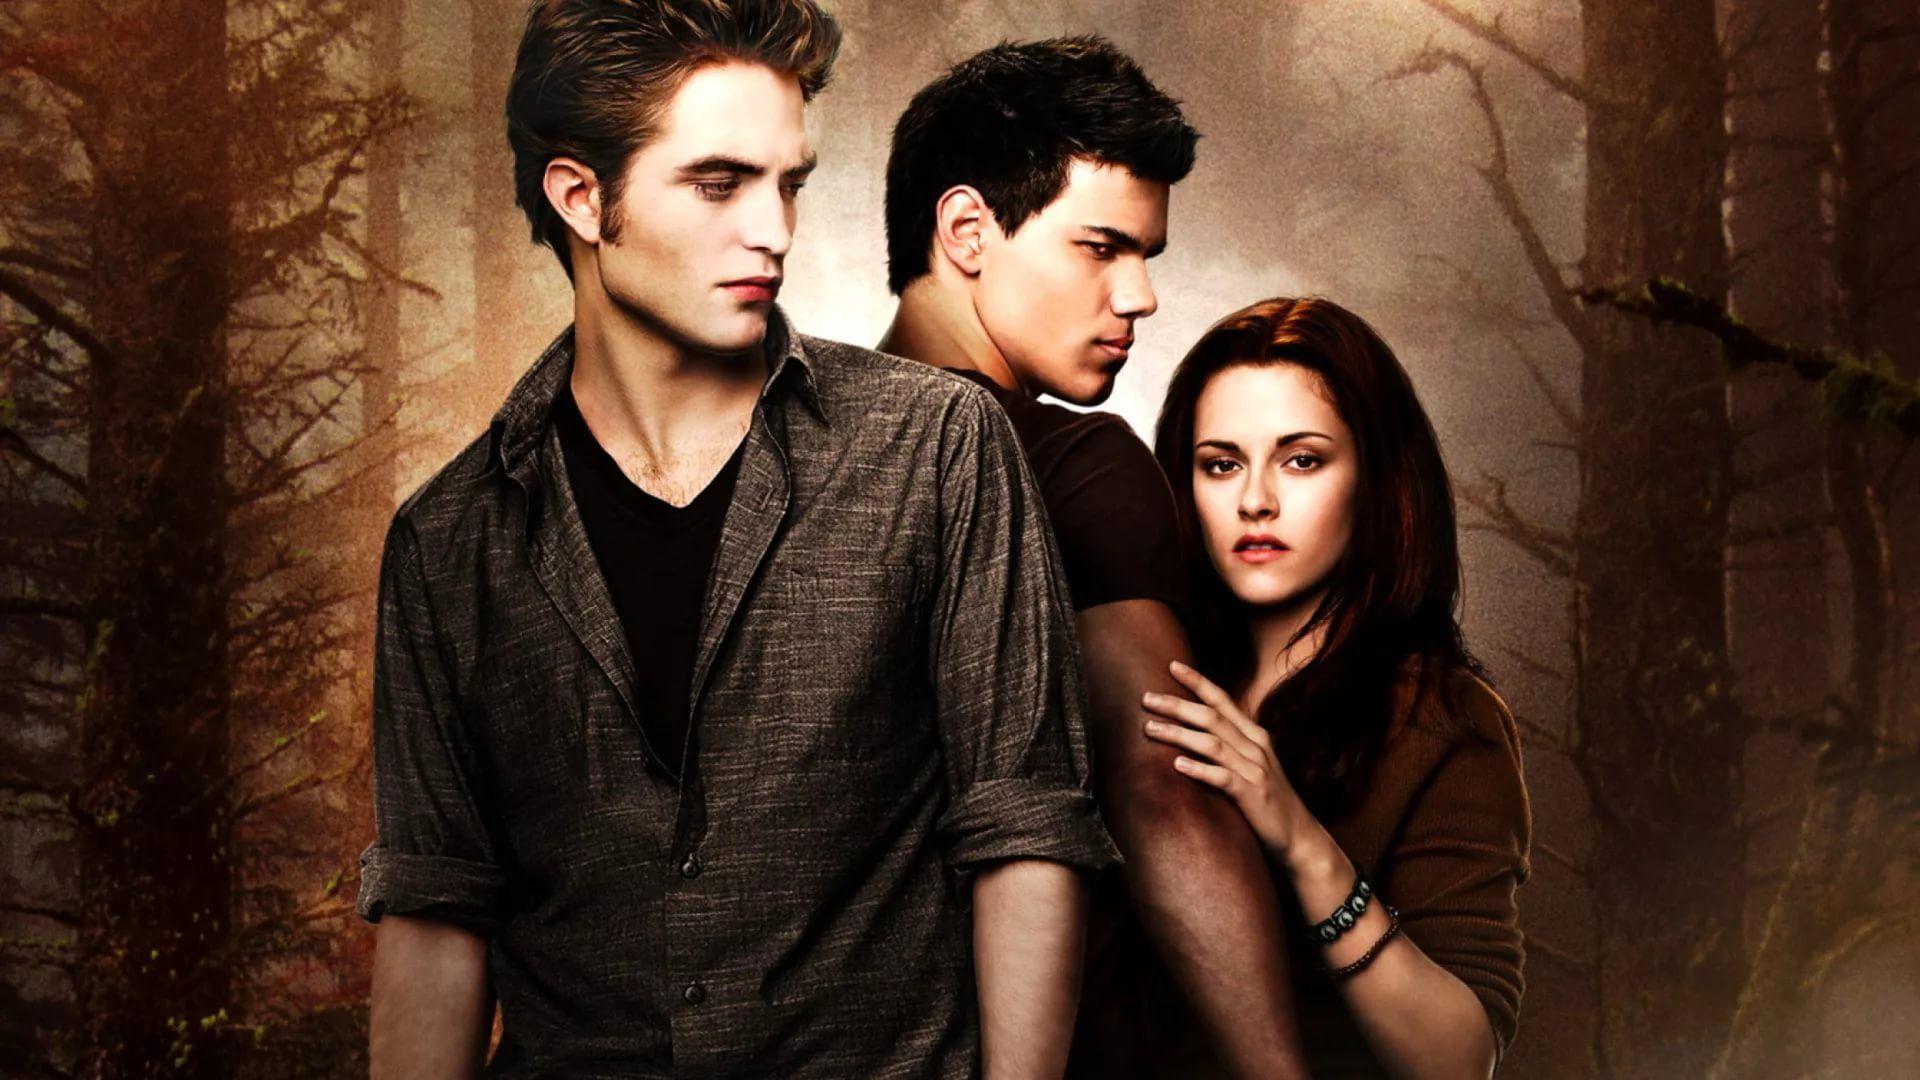 Twilight Saga 1080p Wallpaper